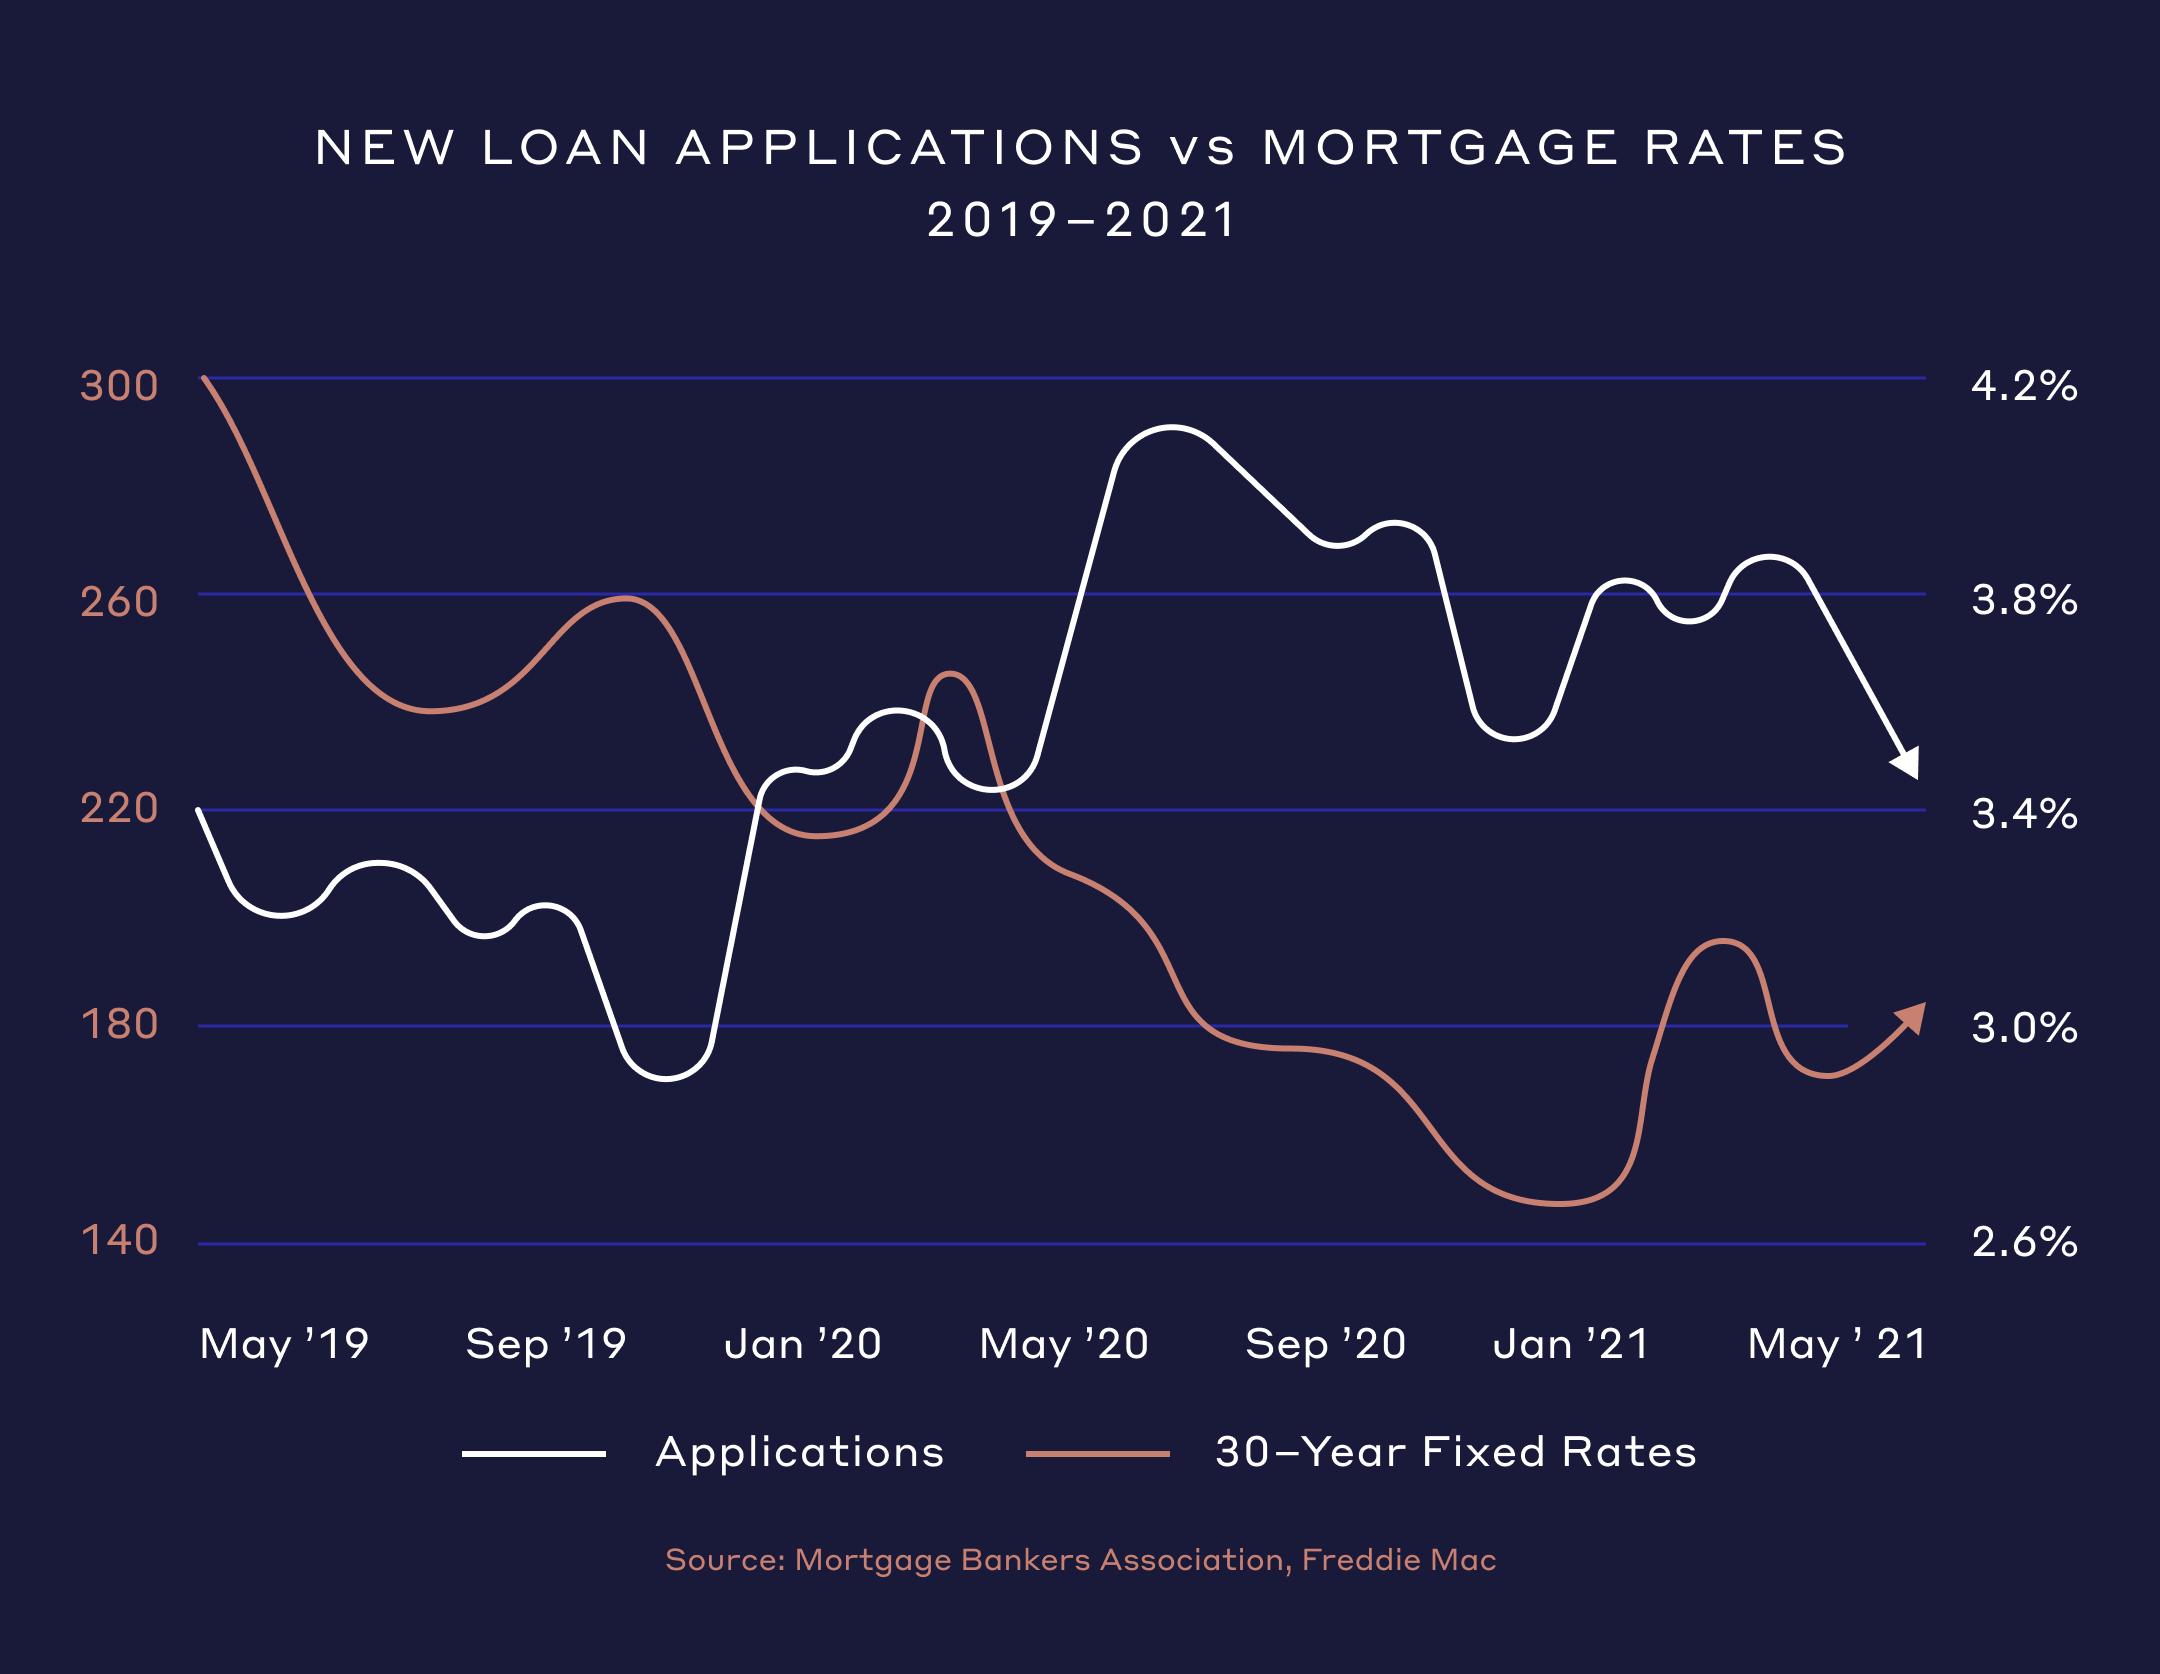 New Loan Applications vs Mortgage Rates